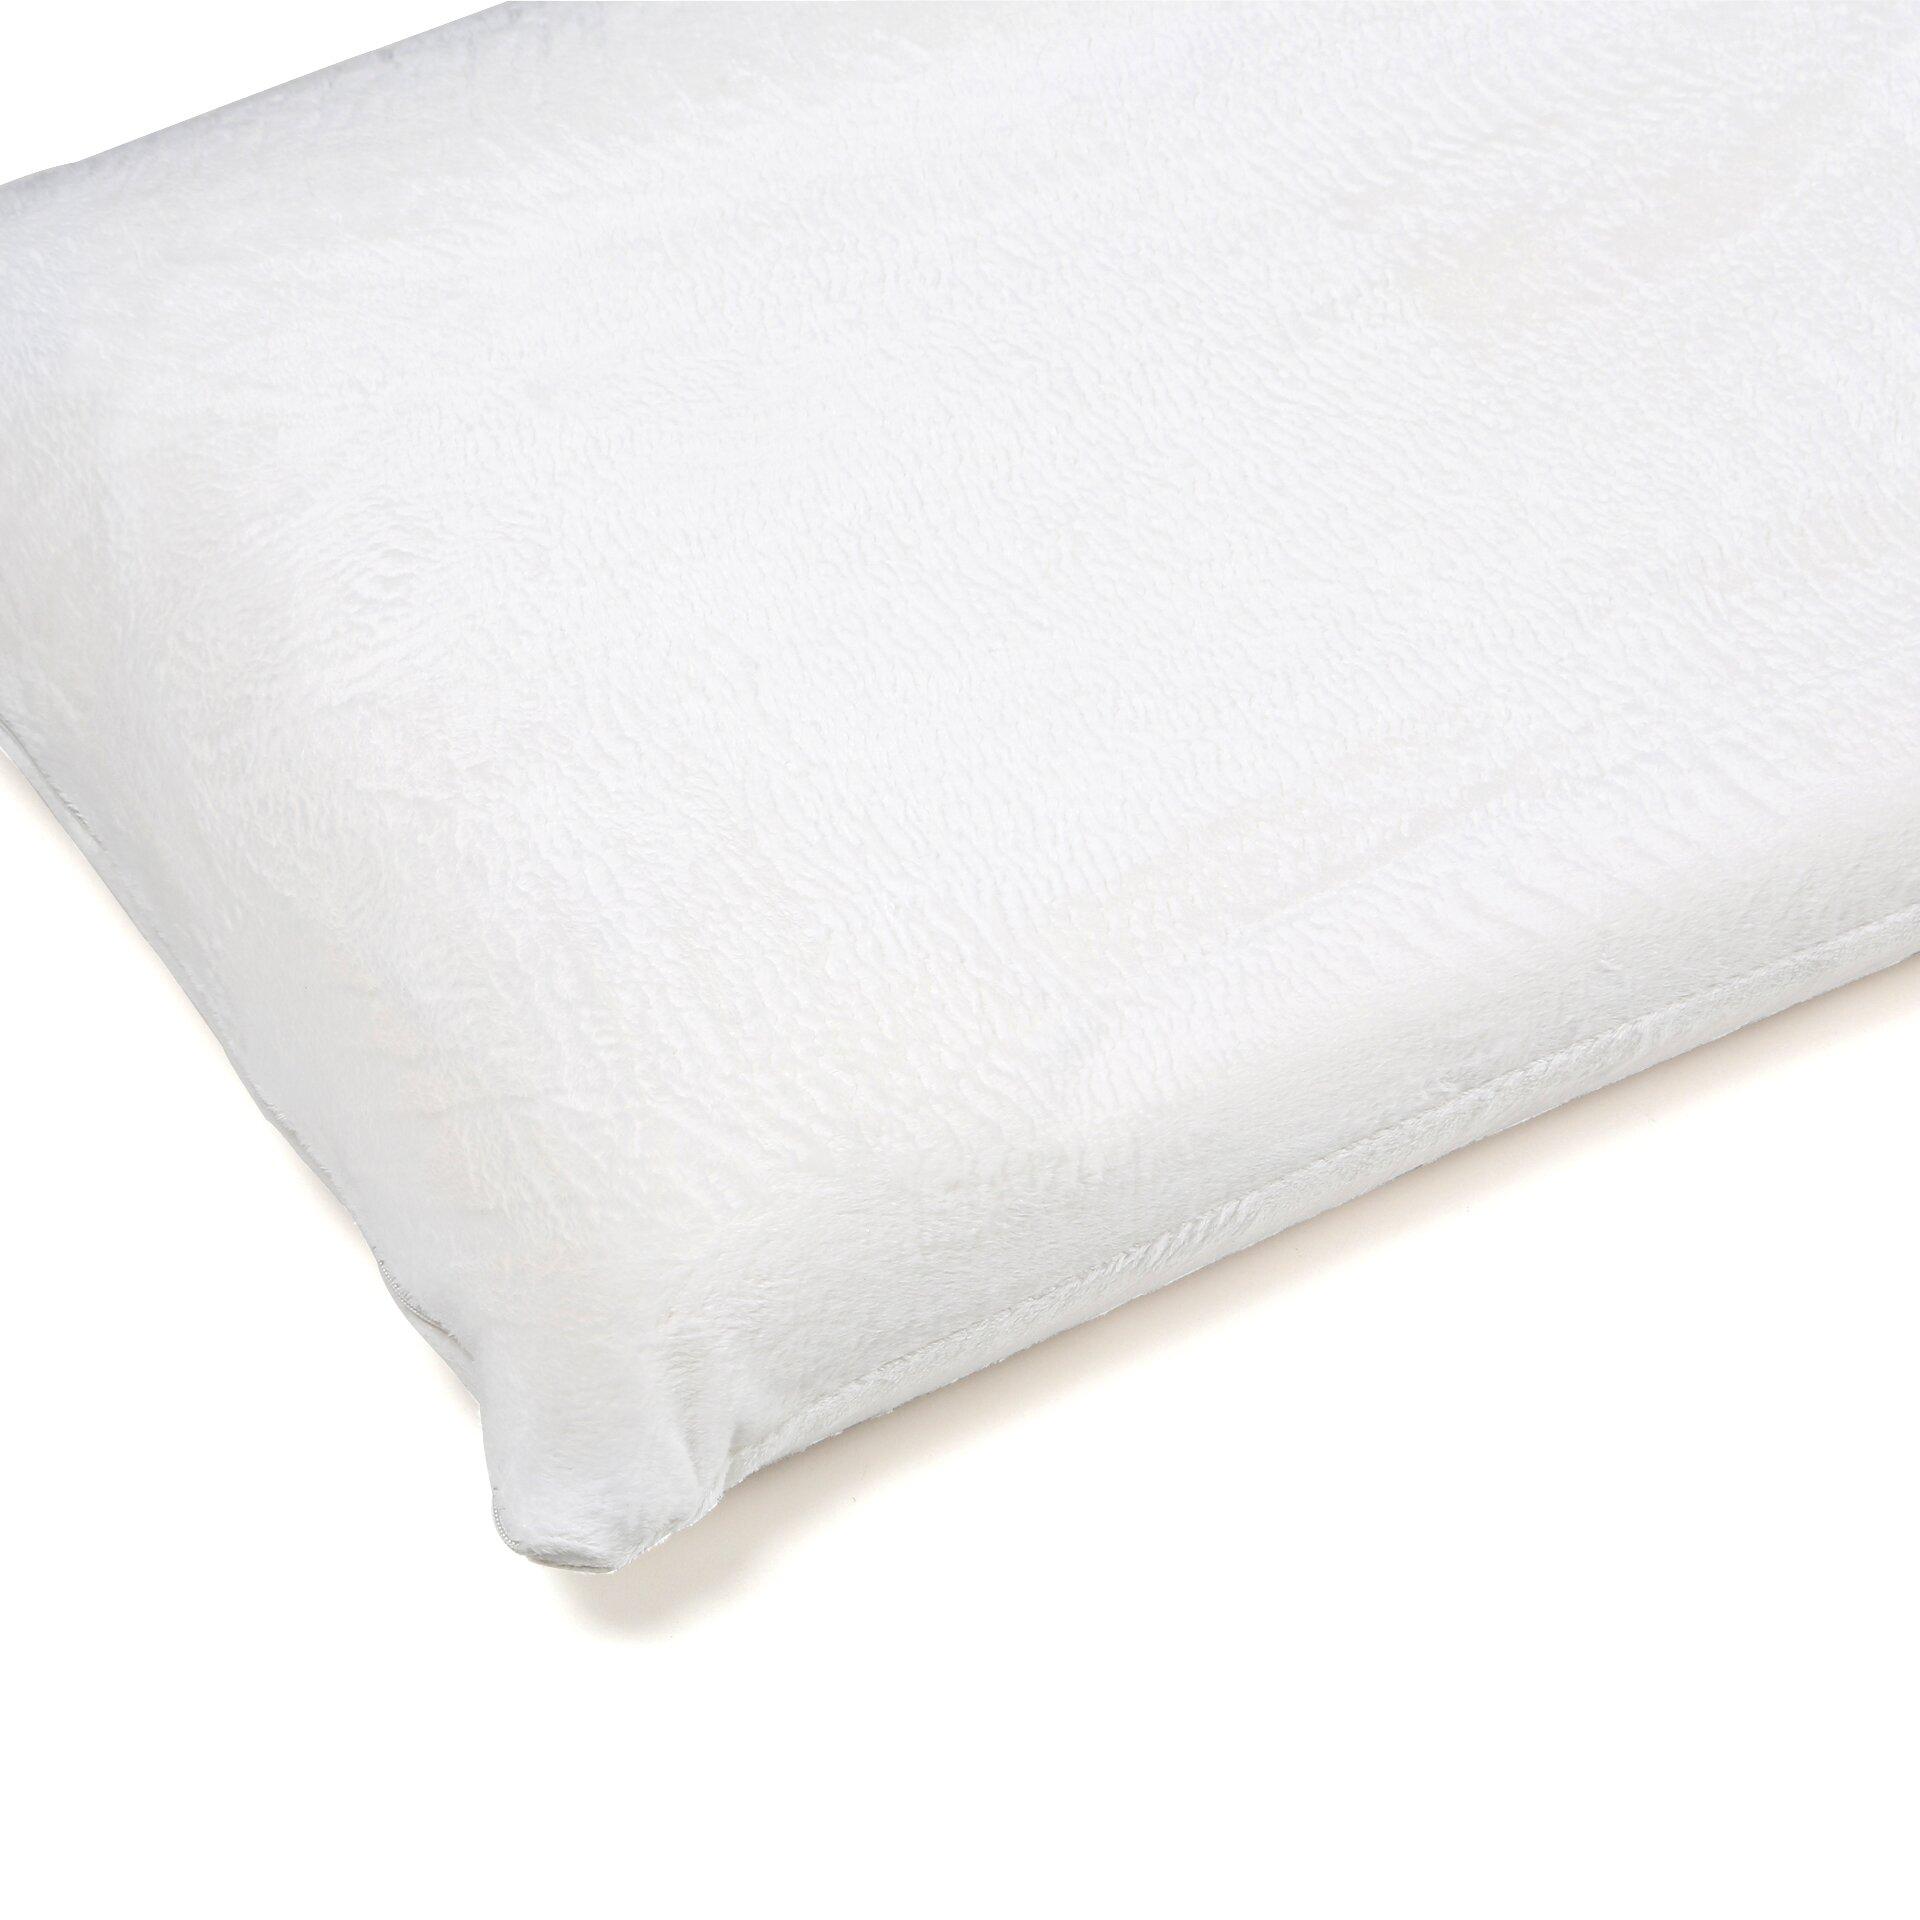 classic brands contour comfort memory foam contour full queen pillow reviews wayfair. Black Bedroom Furniture Sets. Home Design Ideas